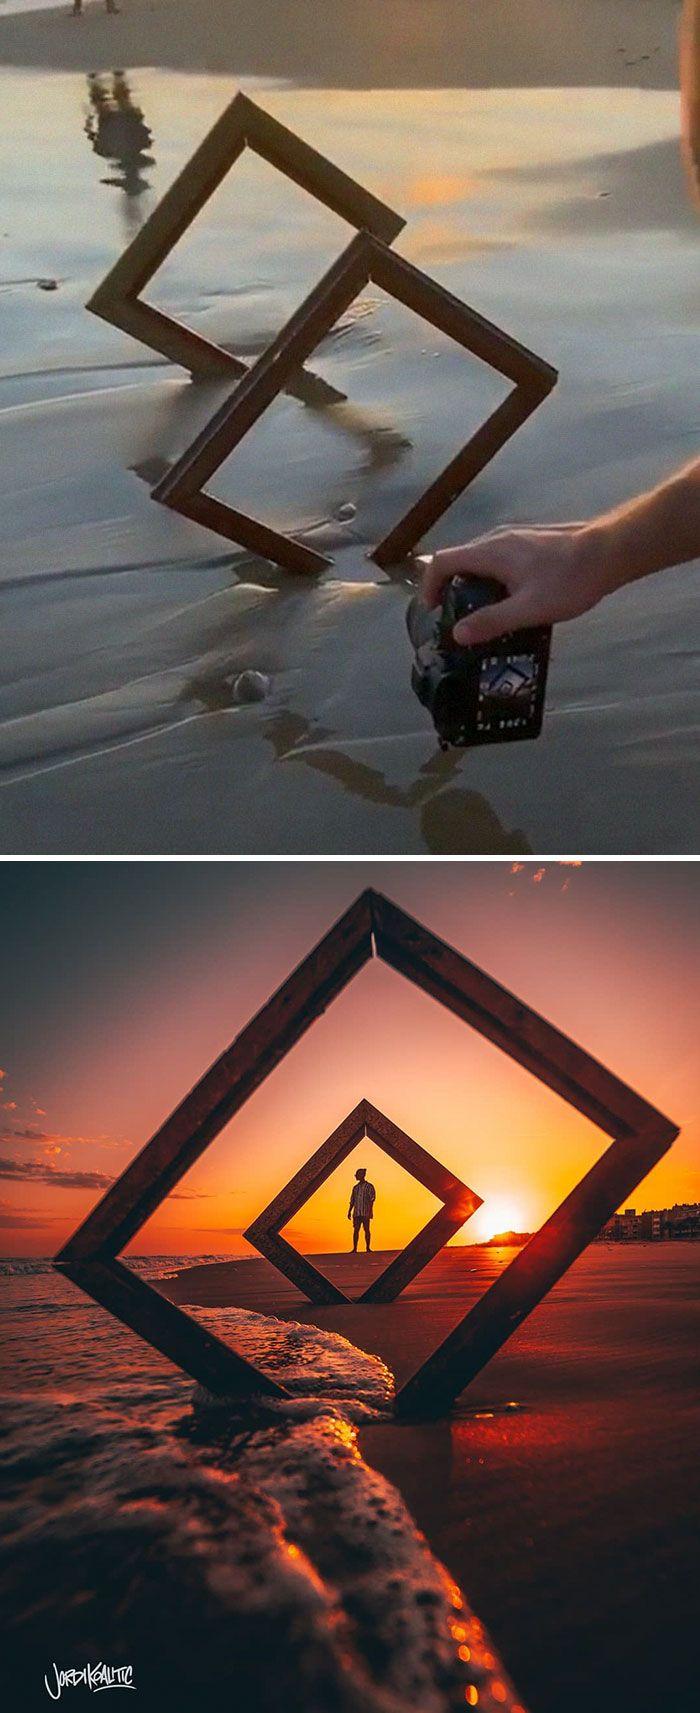 Framing photography tips